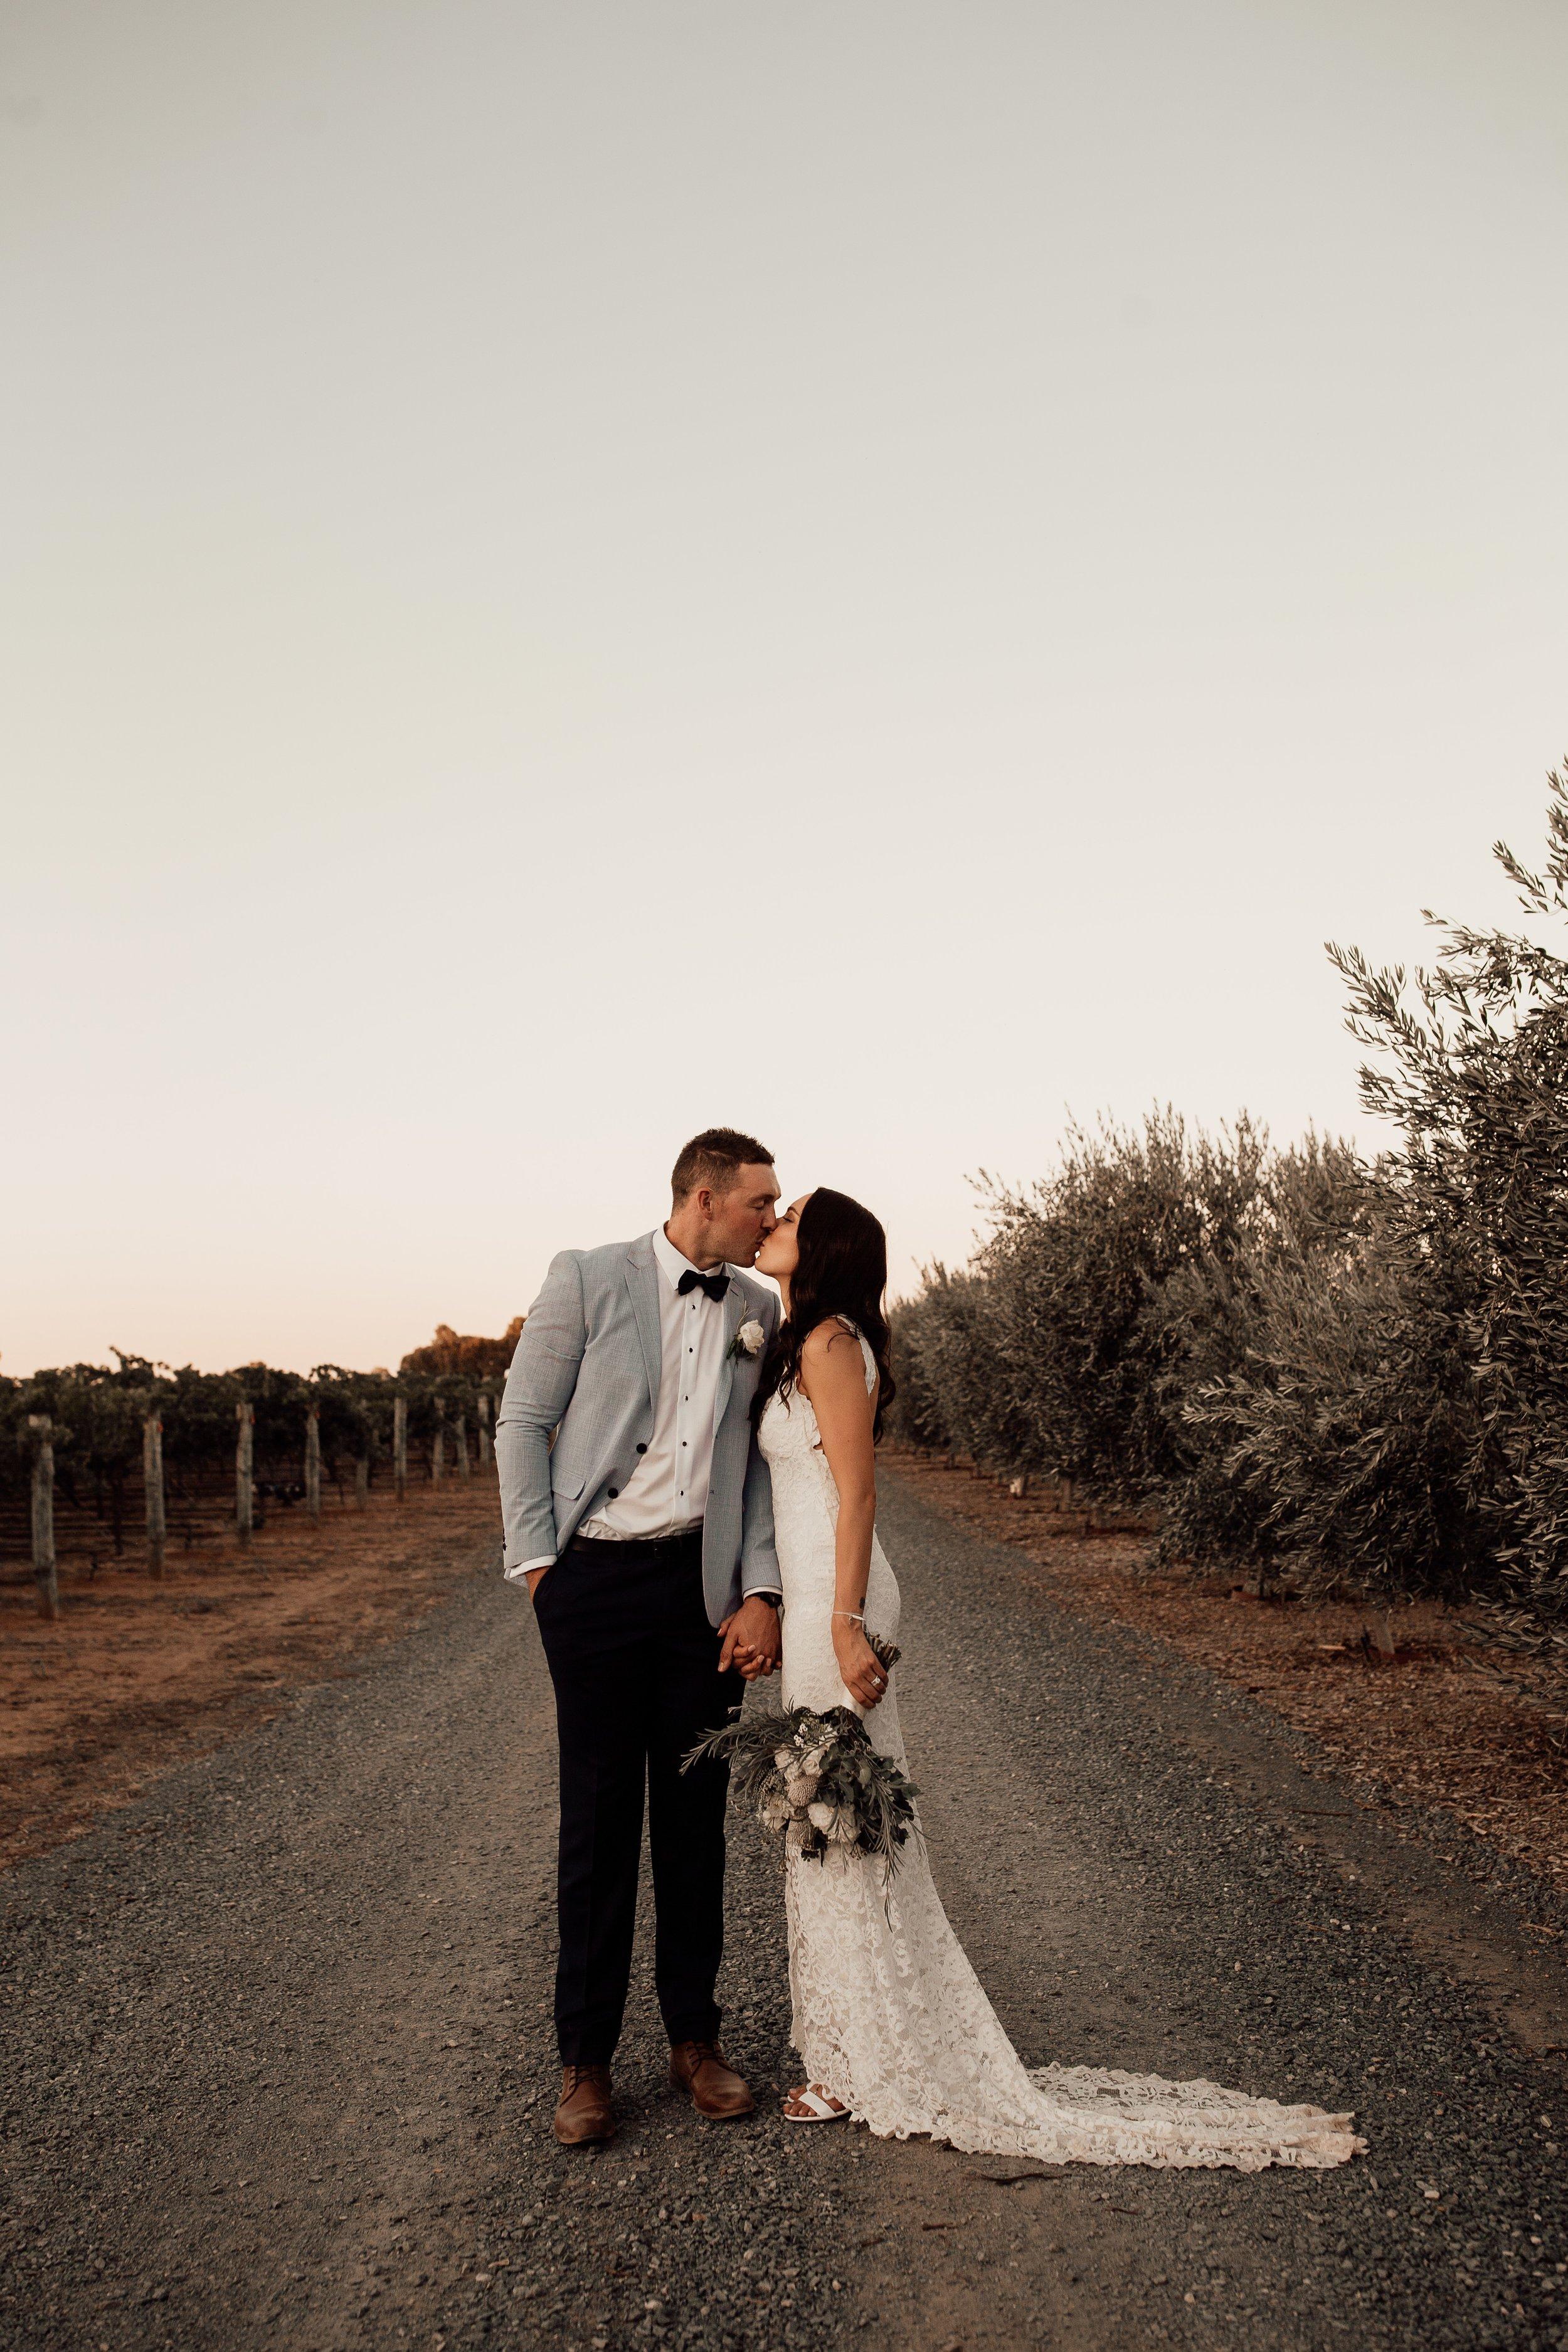 mickalathomas_puremacphotography_weddingphotographer_couplephotographer_Sheppartonphotographer_2926.jpg